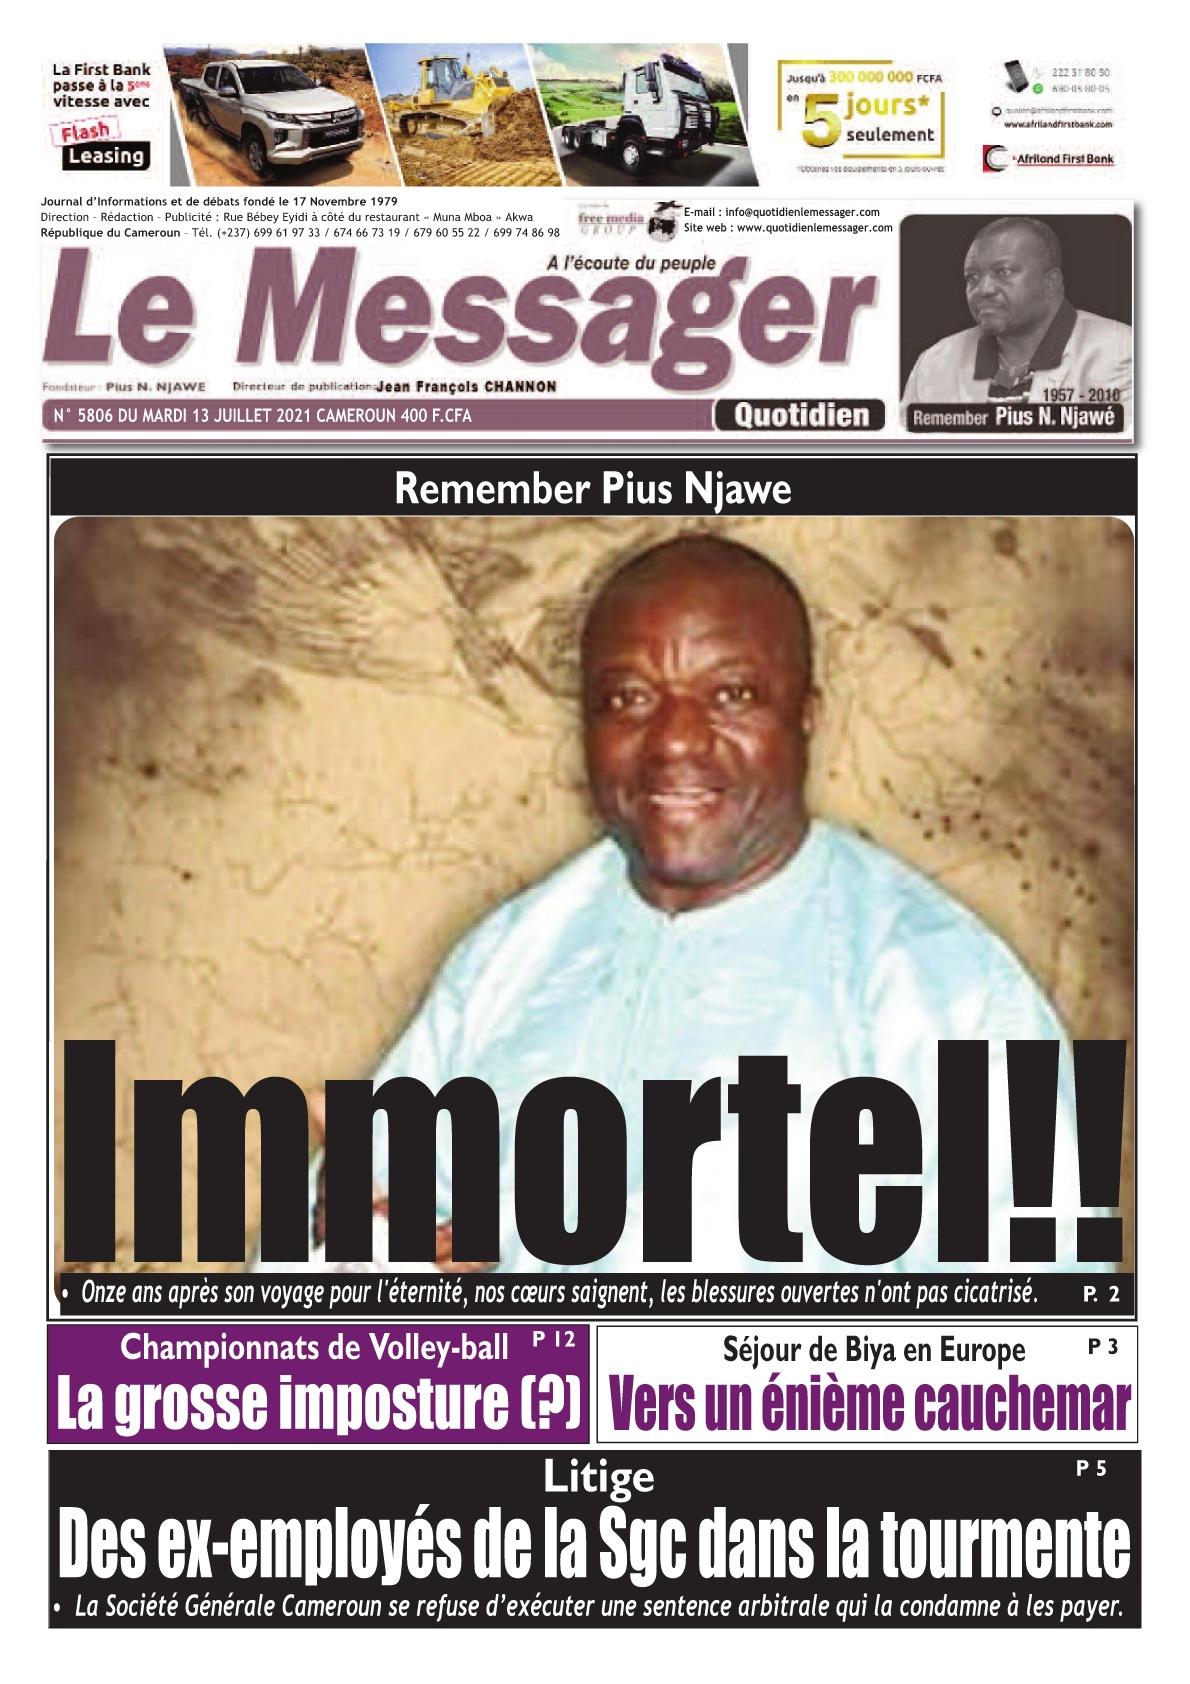 Le Messager - 13/07/2021